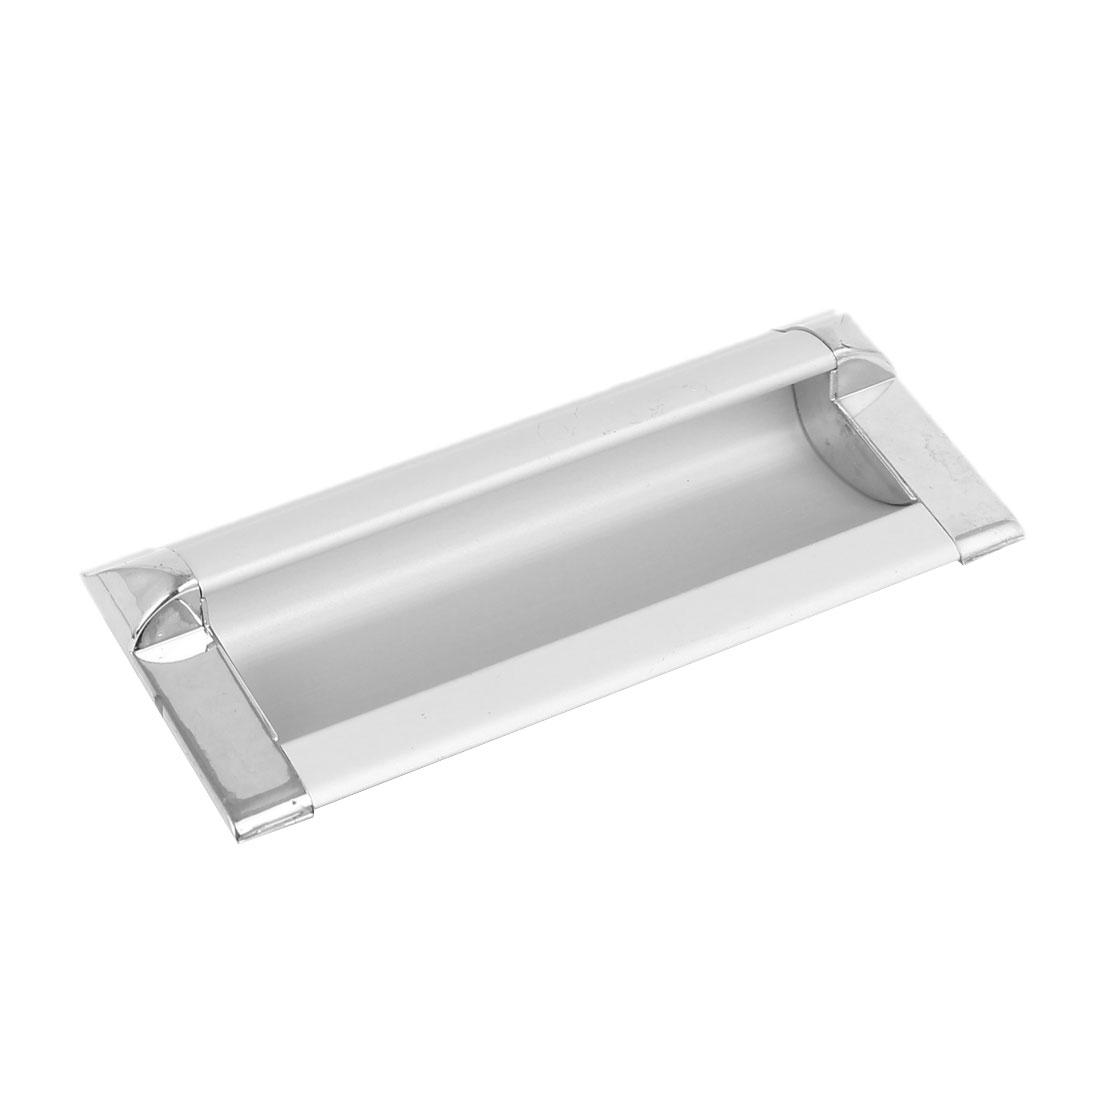 108mmx47mmx20mm Metal Recessed Rectangular Flush Pull Handle Silver Tone